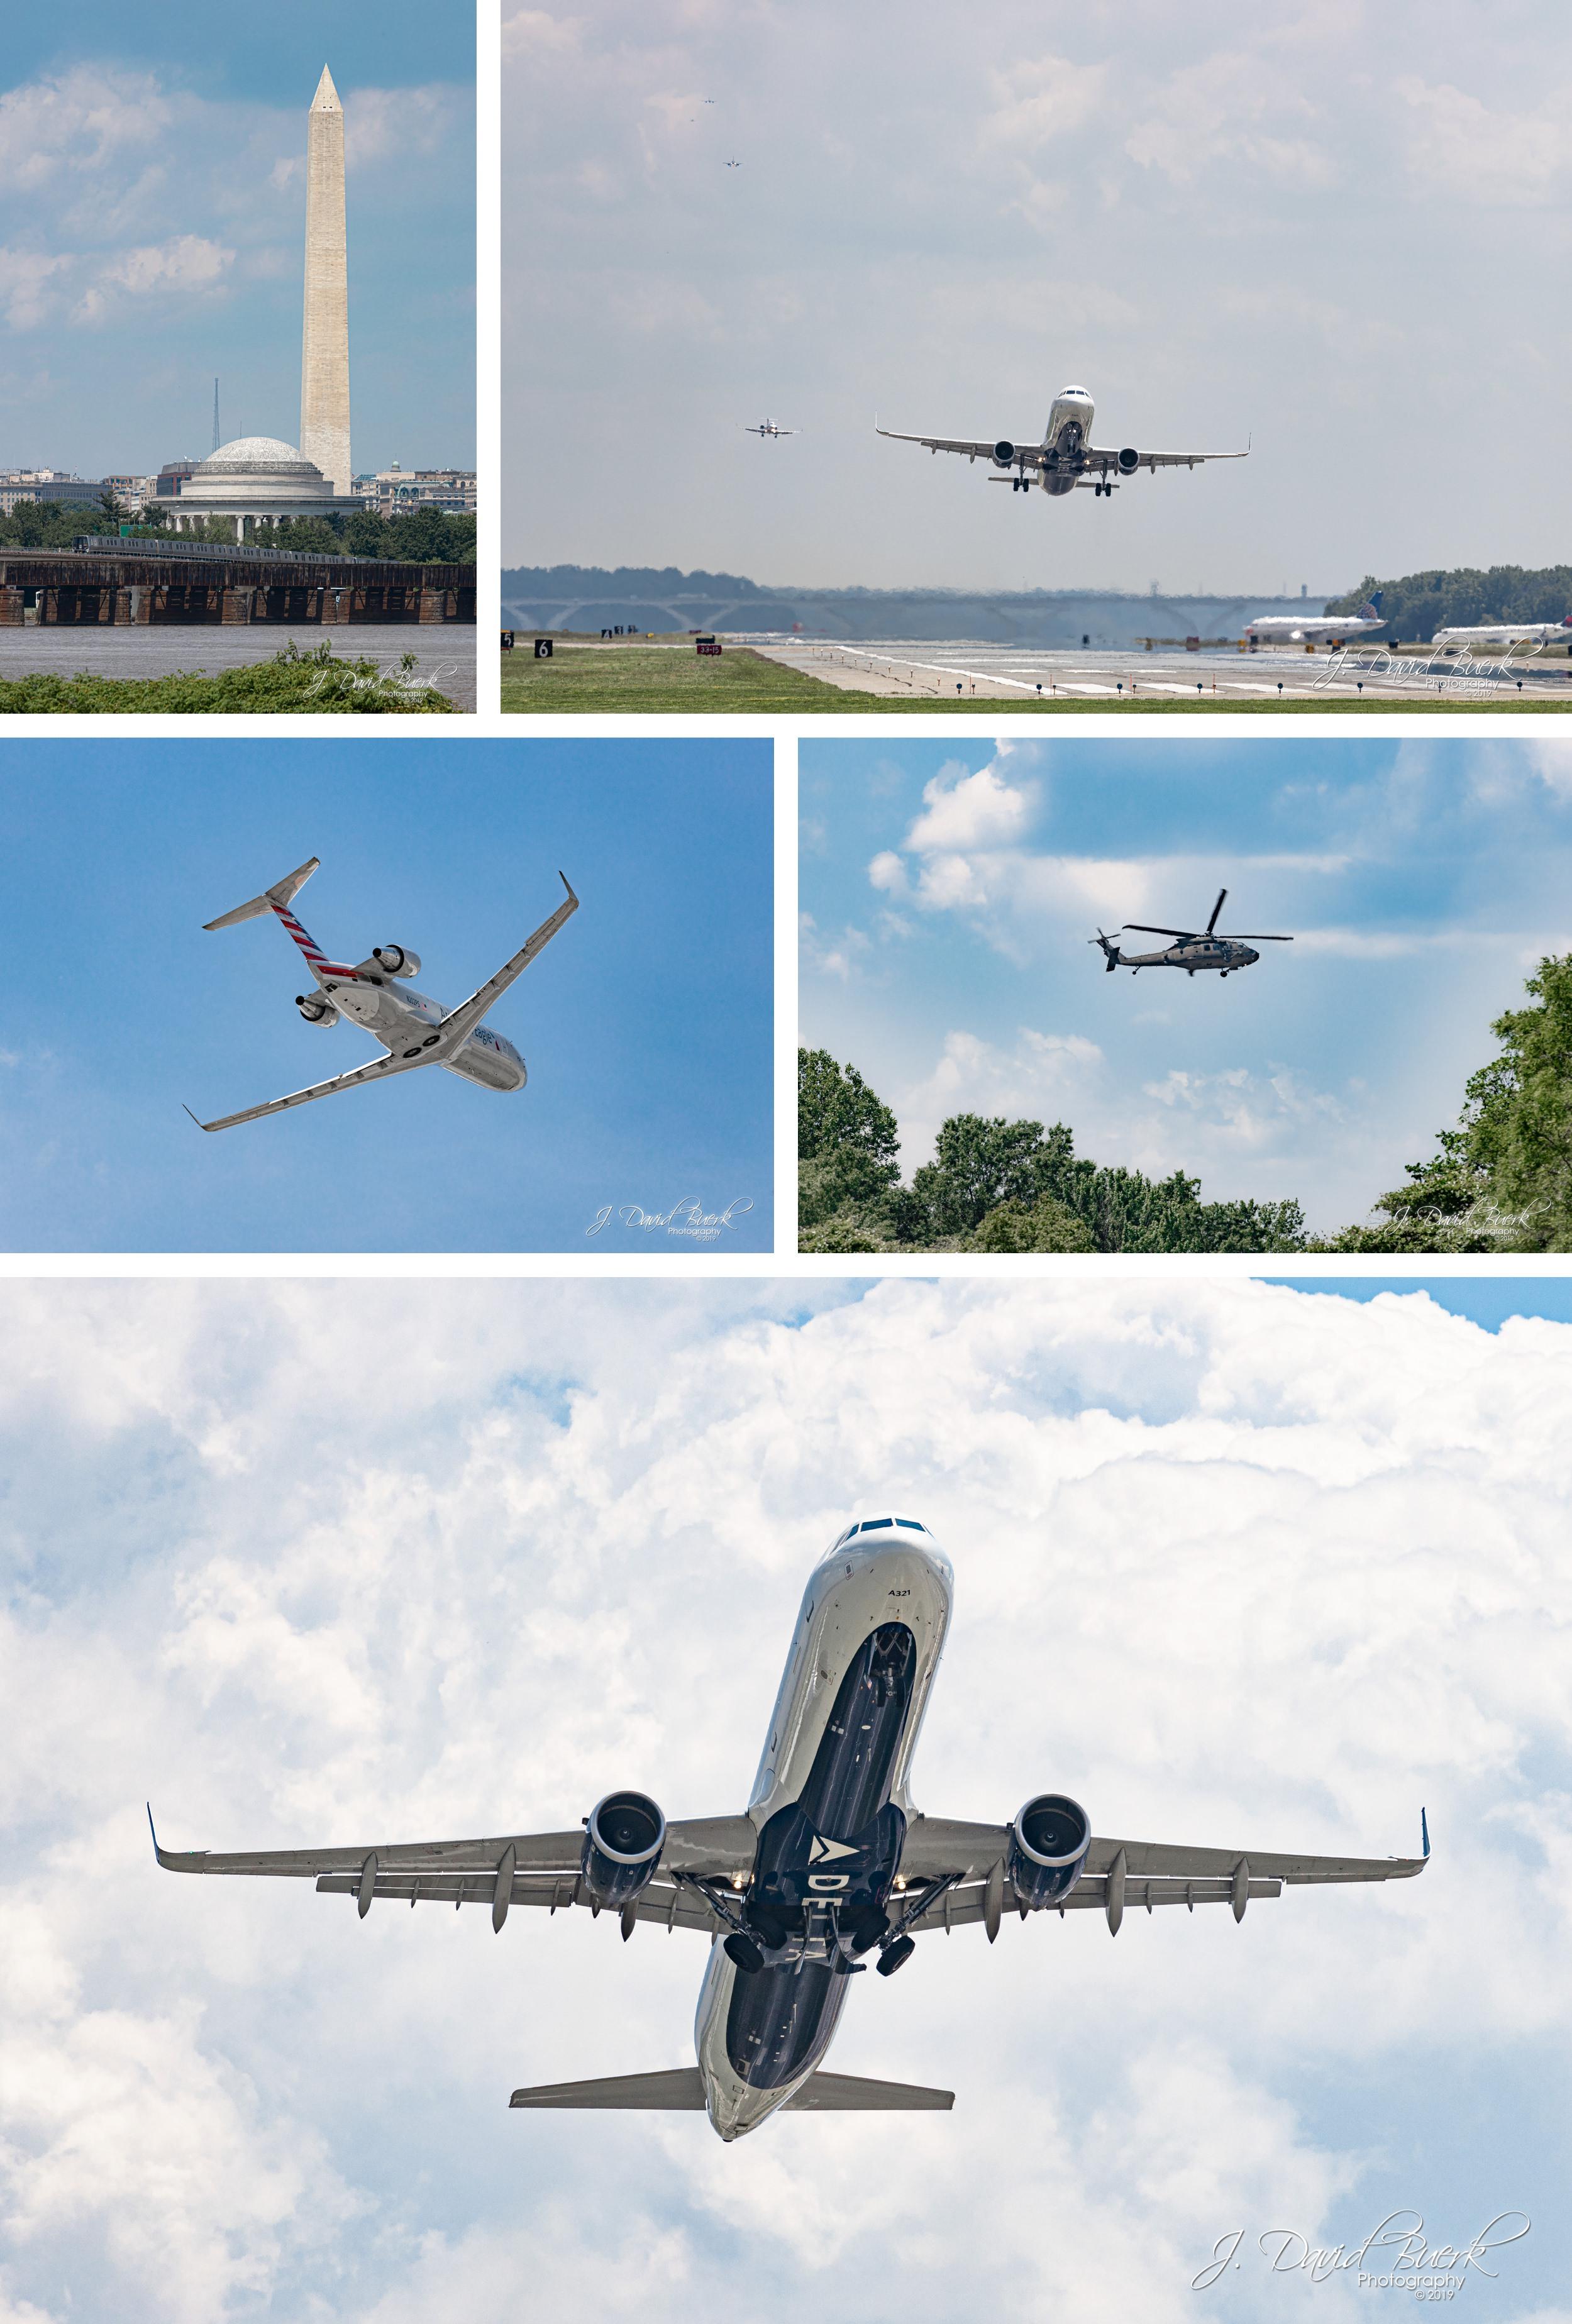 20190516 - DCA Planespotting 3.jpg